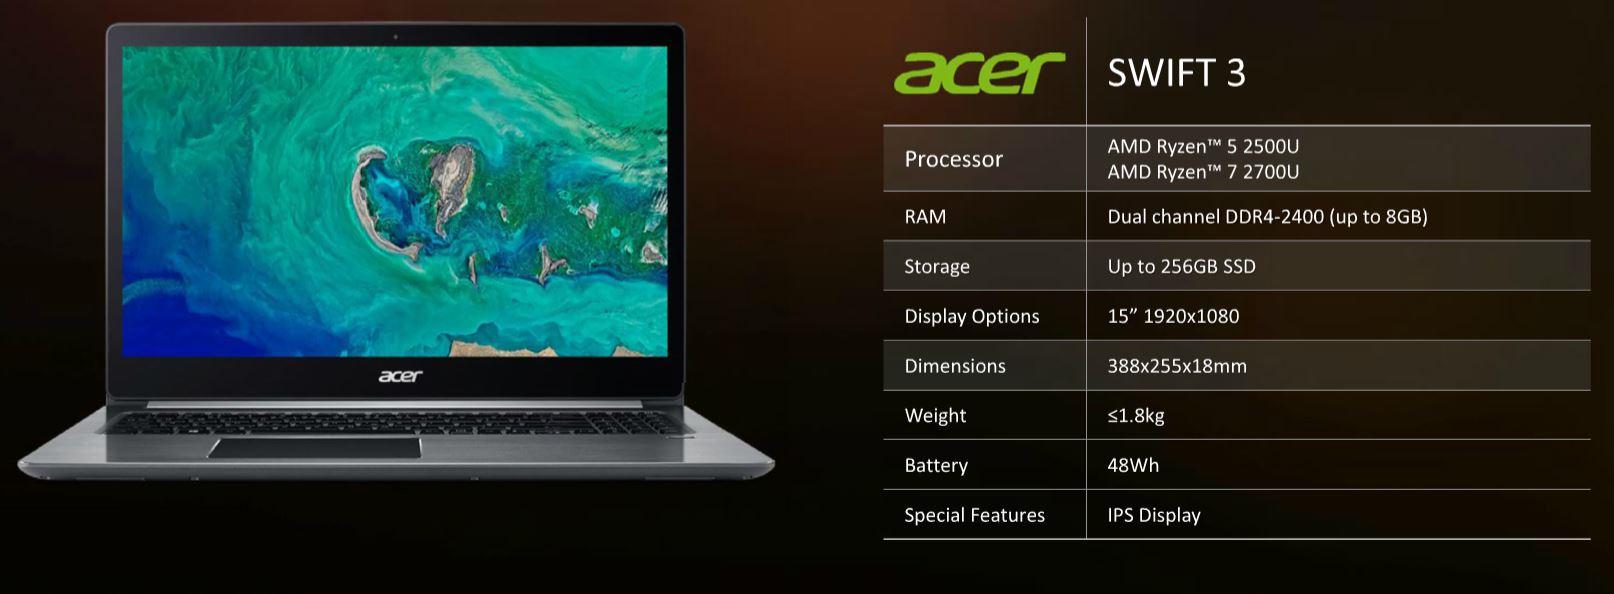 AMD Ryzen Mobile Acer Swift 3